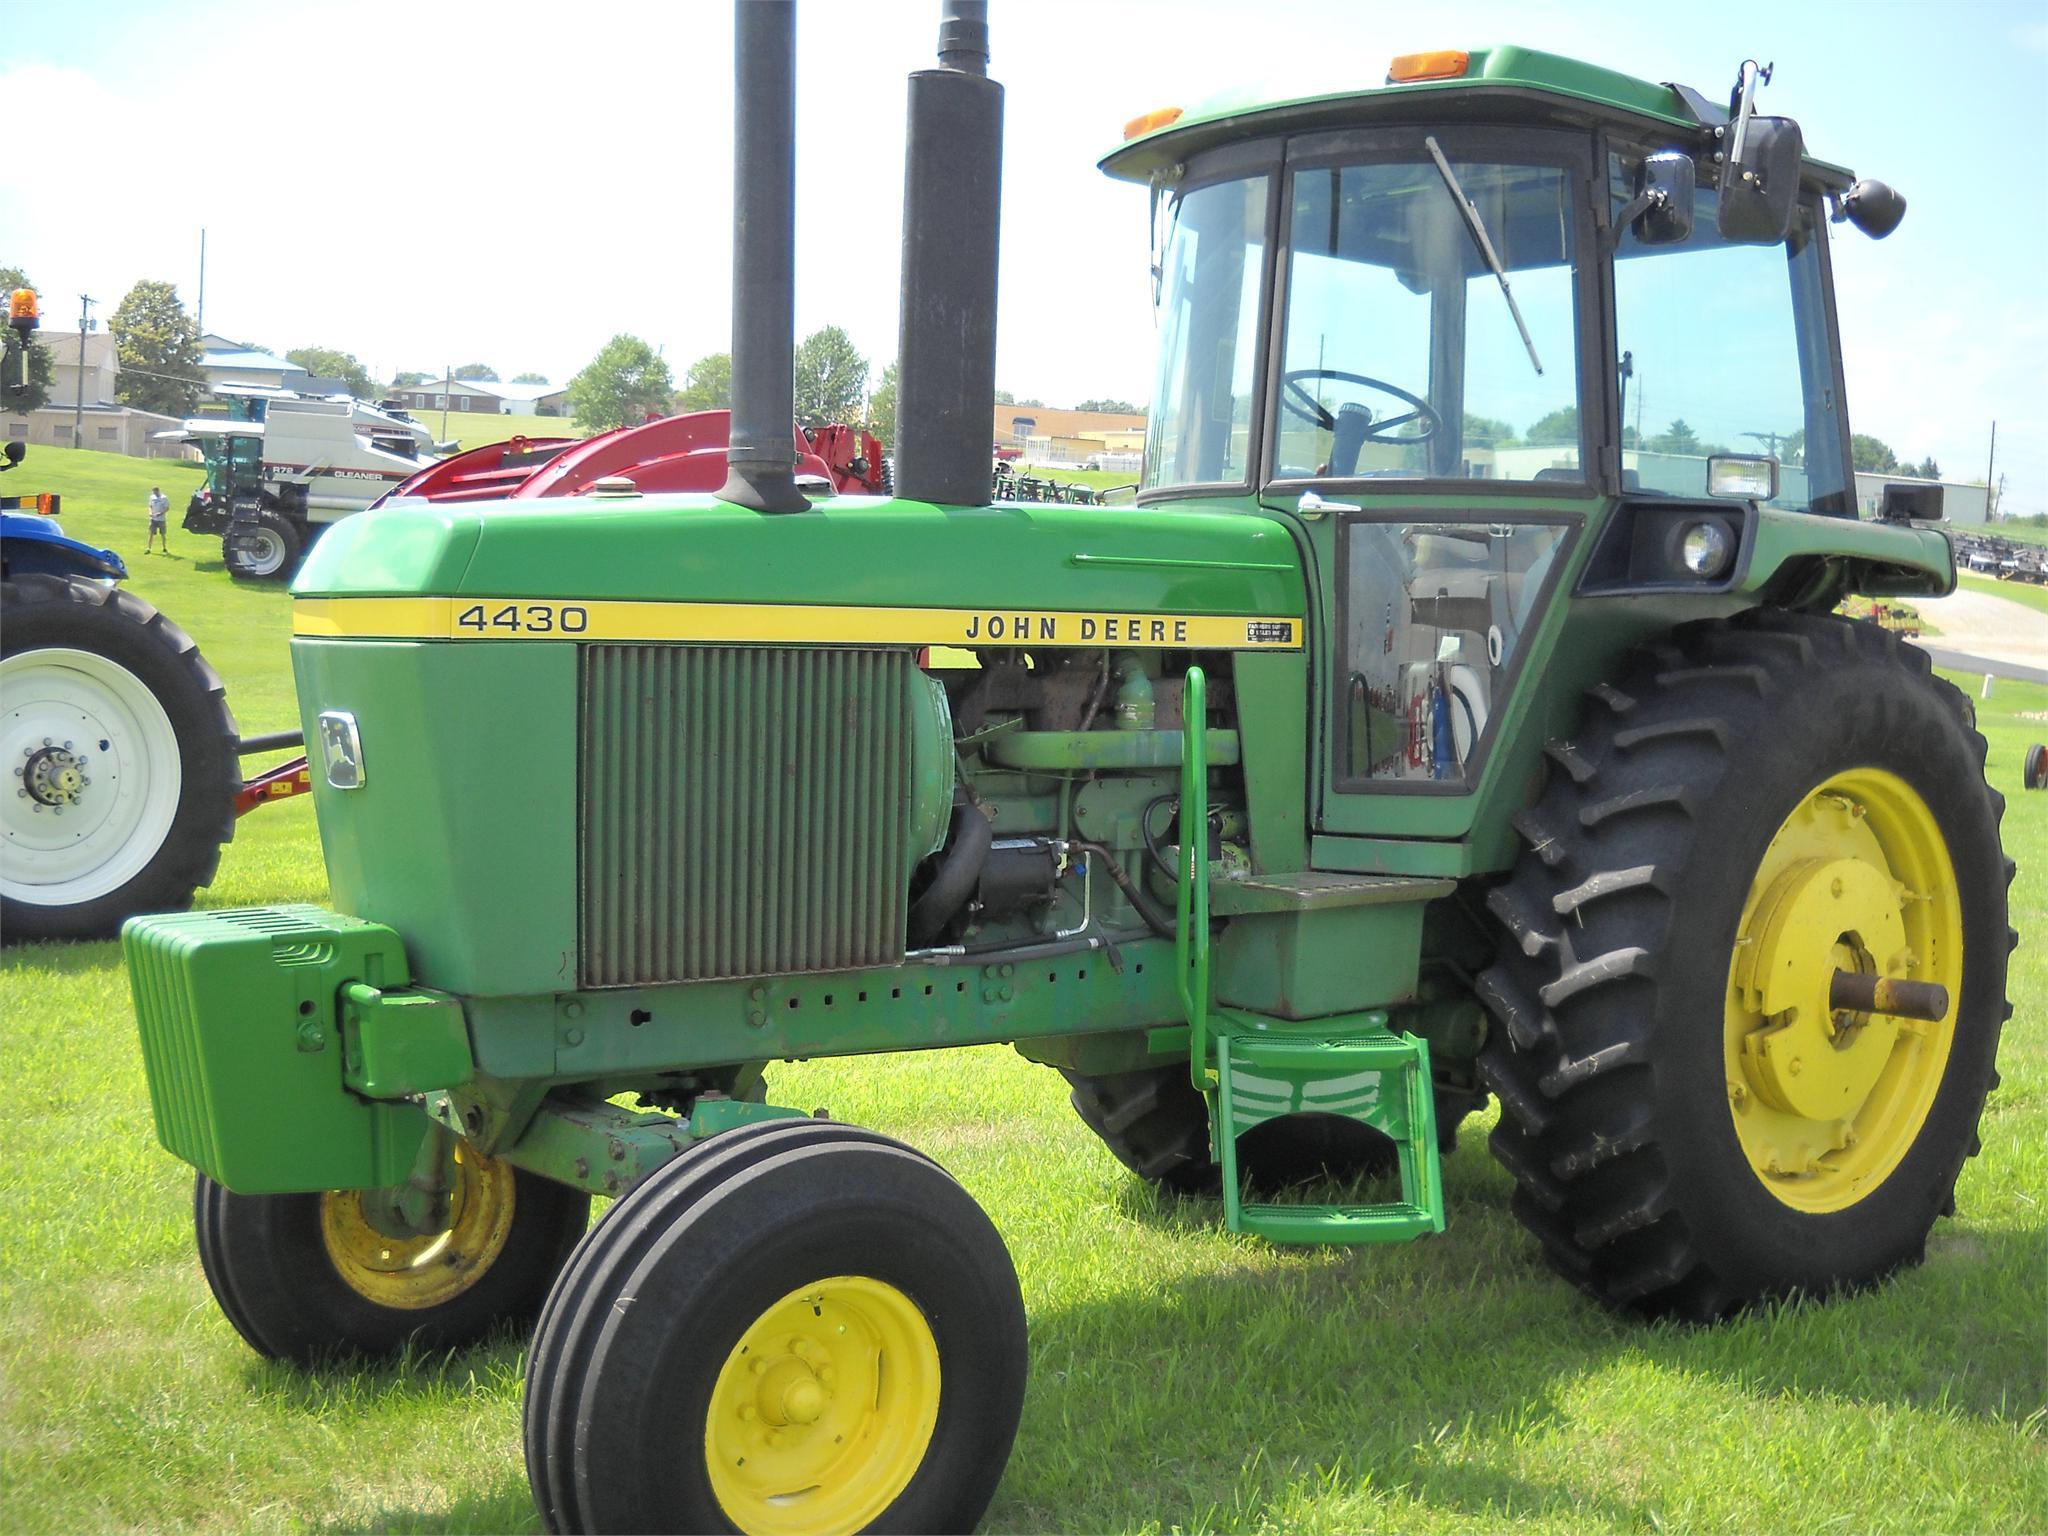 $21,500, 1974 John Deere 4430